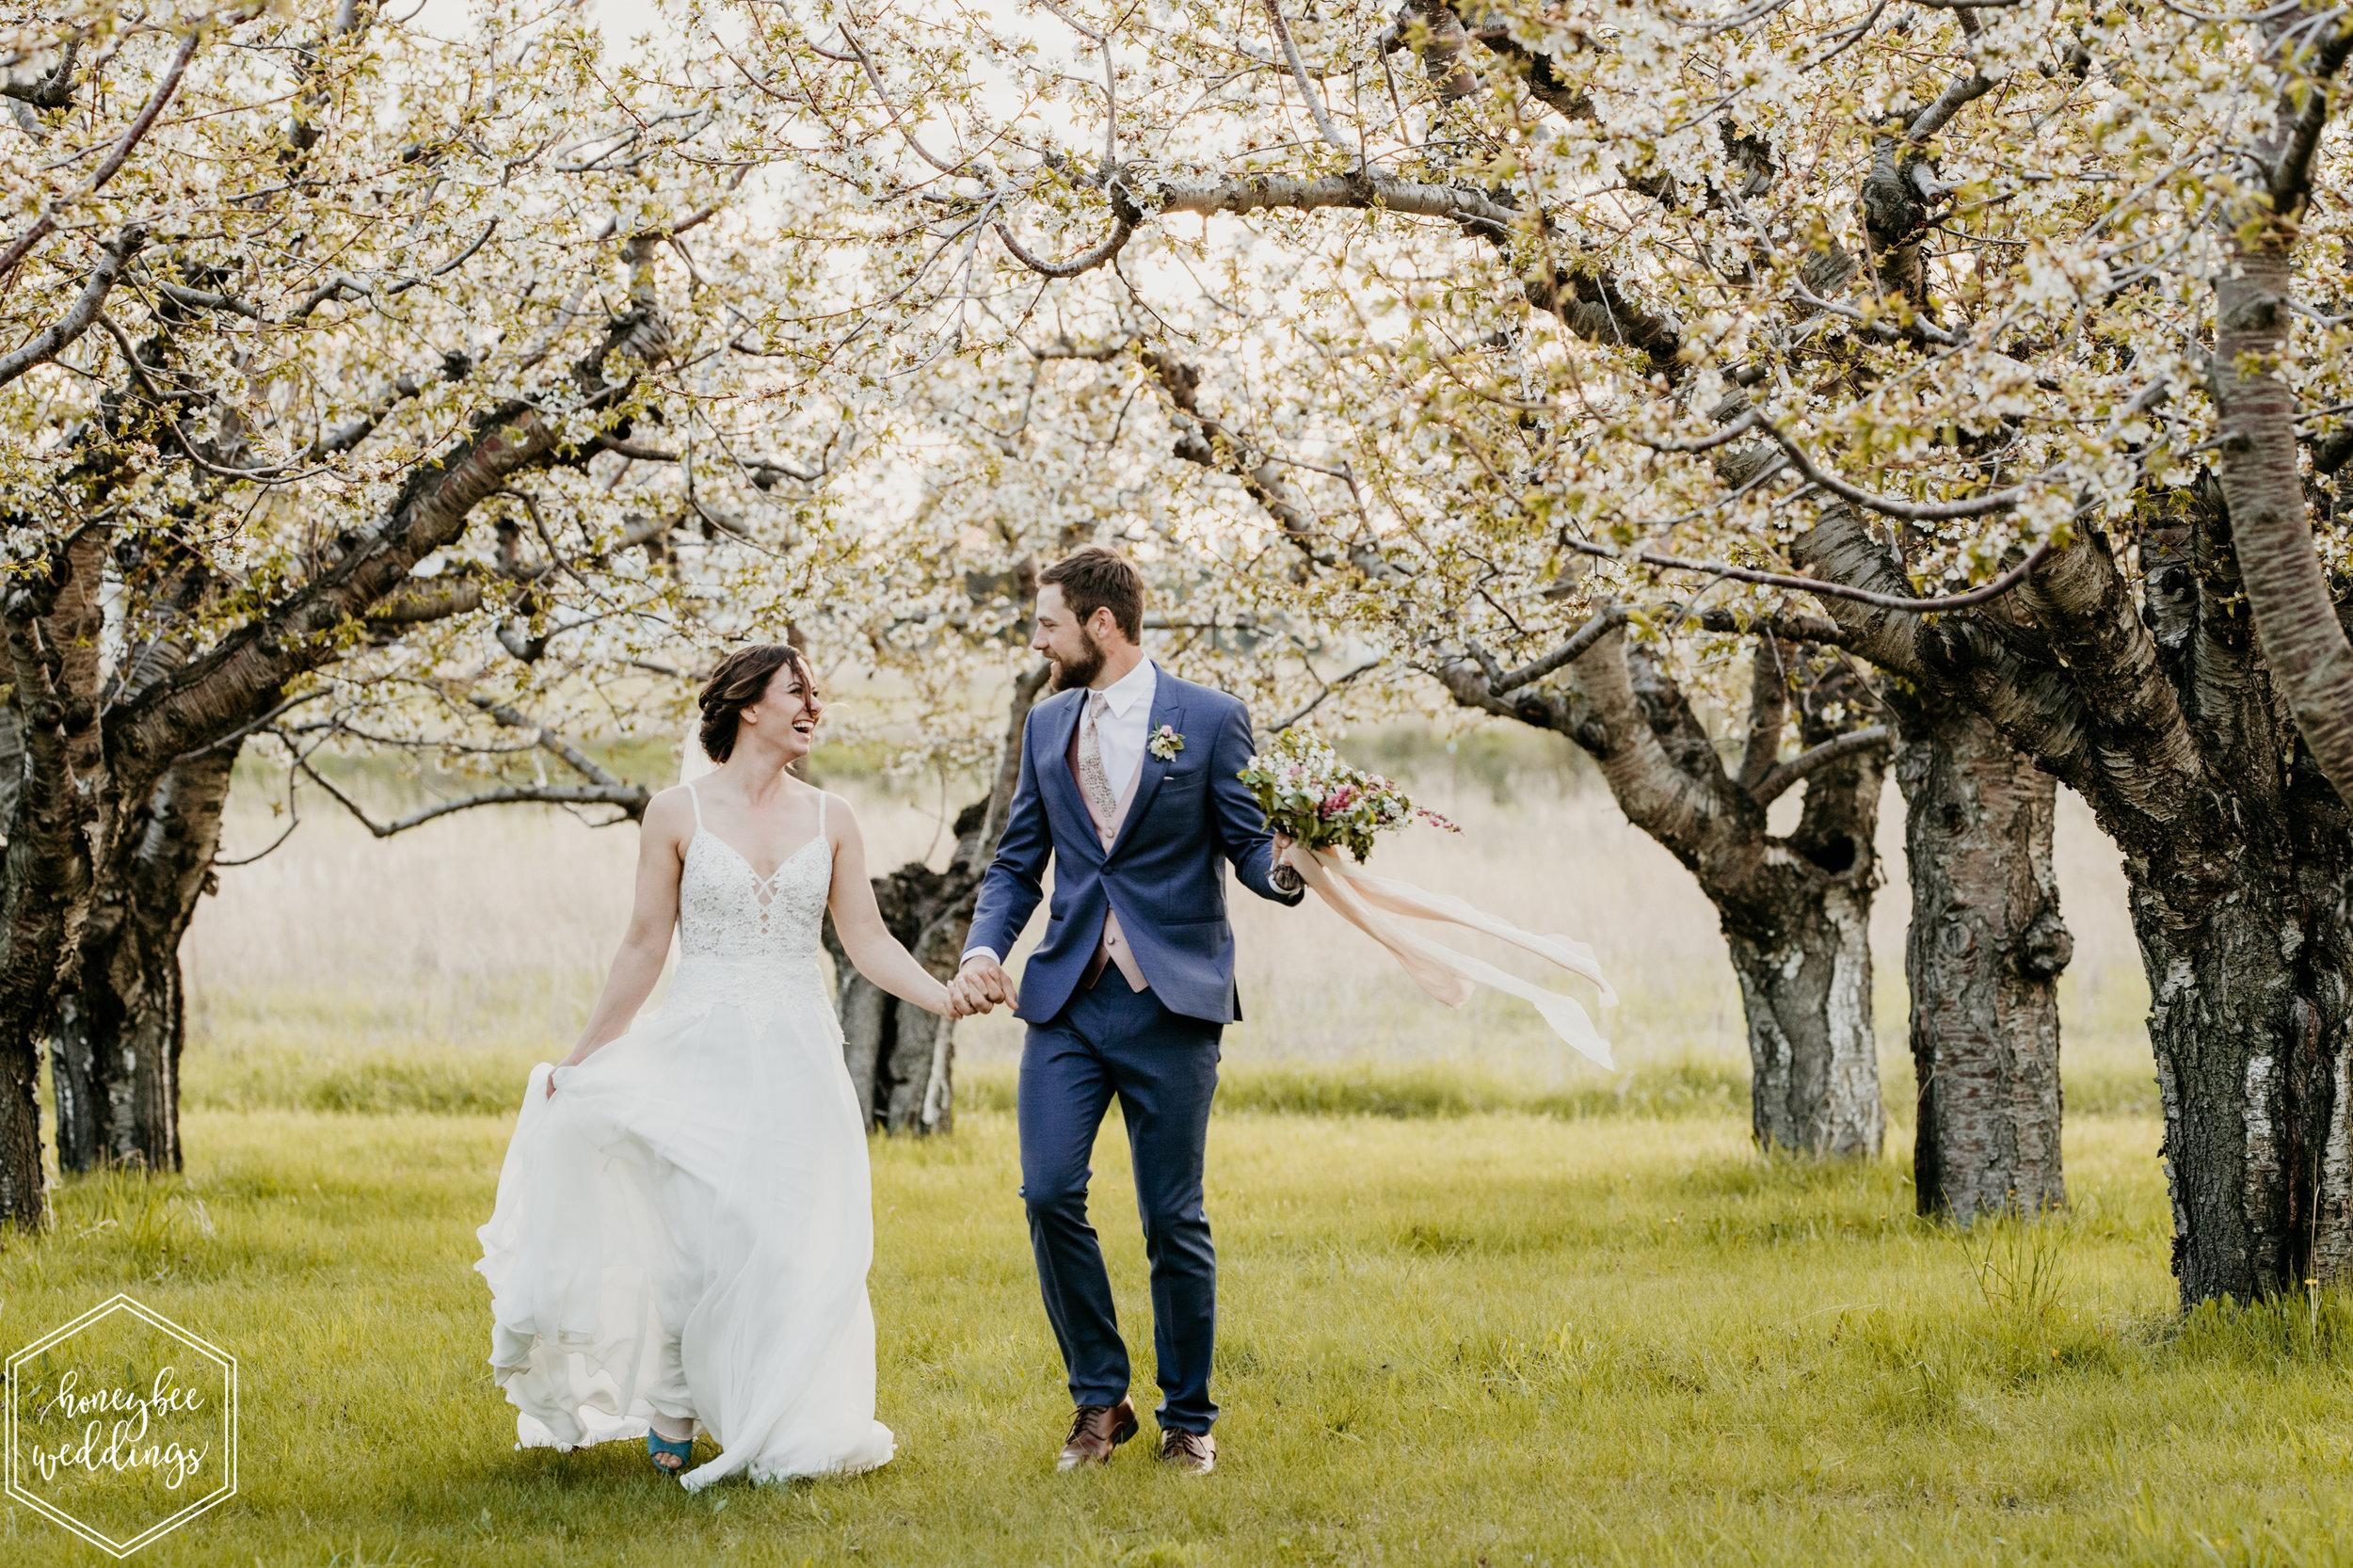 181Cherry Blossom Wedding_Styled Photoshoot_Honeybee Weddings_May 11, 2019-721.jpg